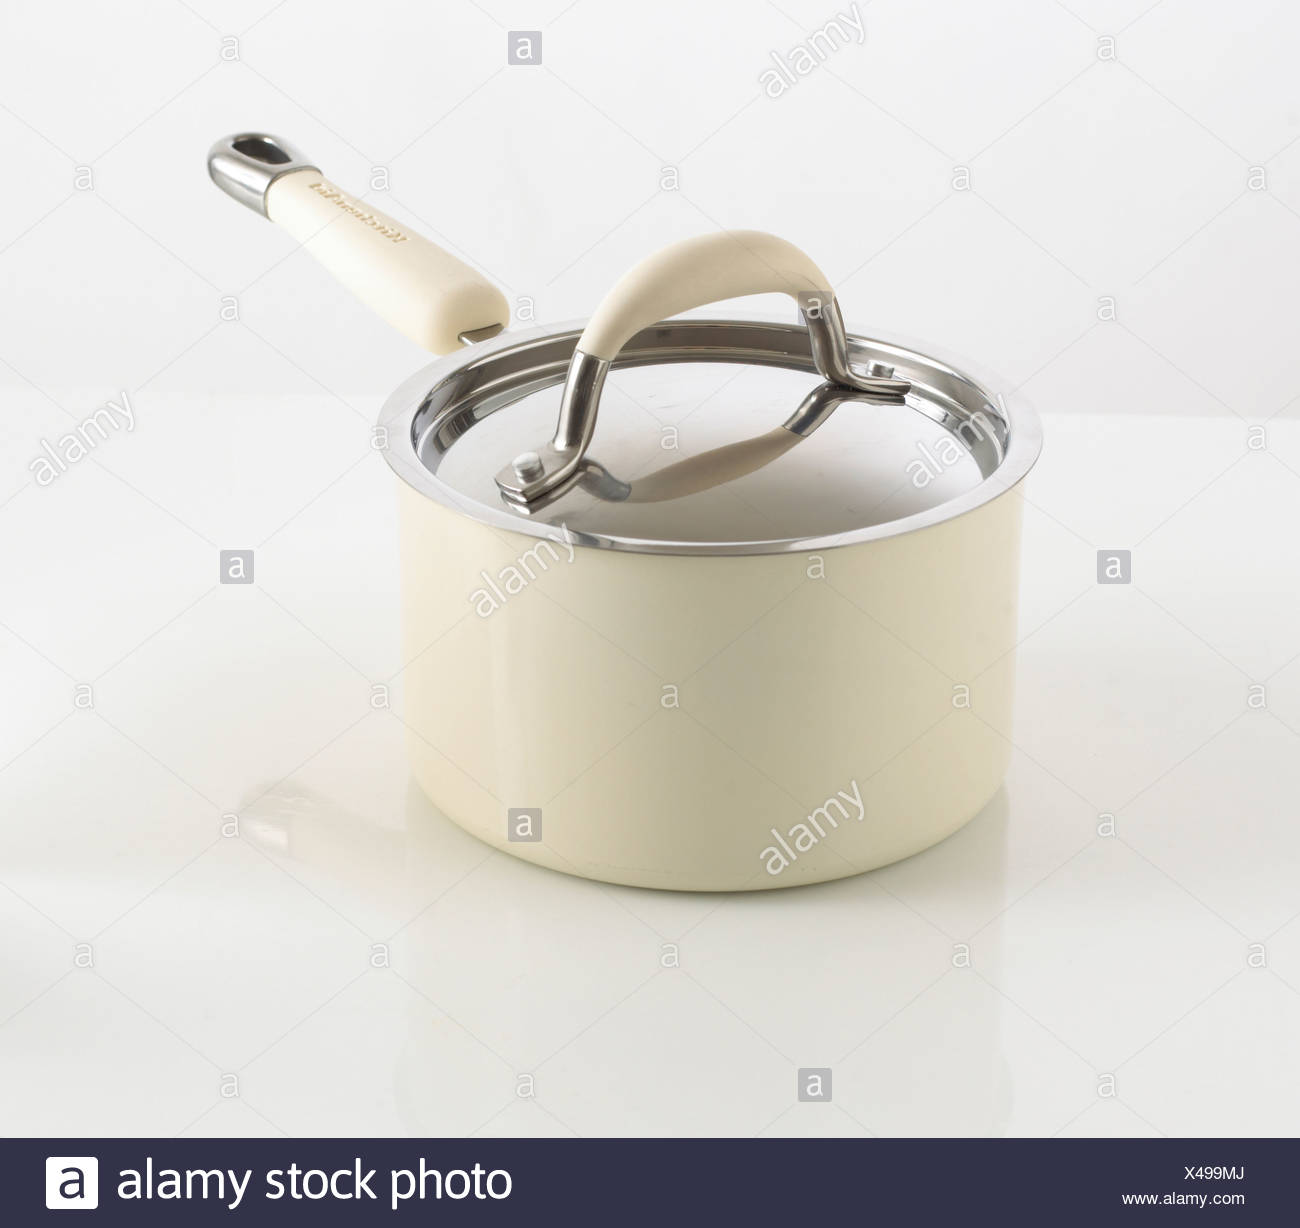 Cream saucepan and lid - Stock Image